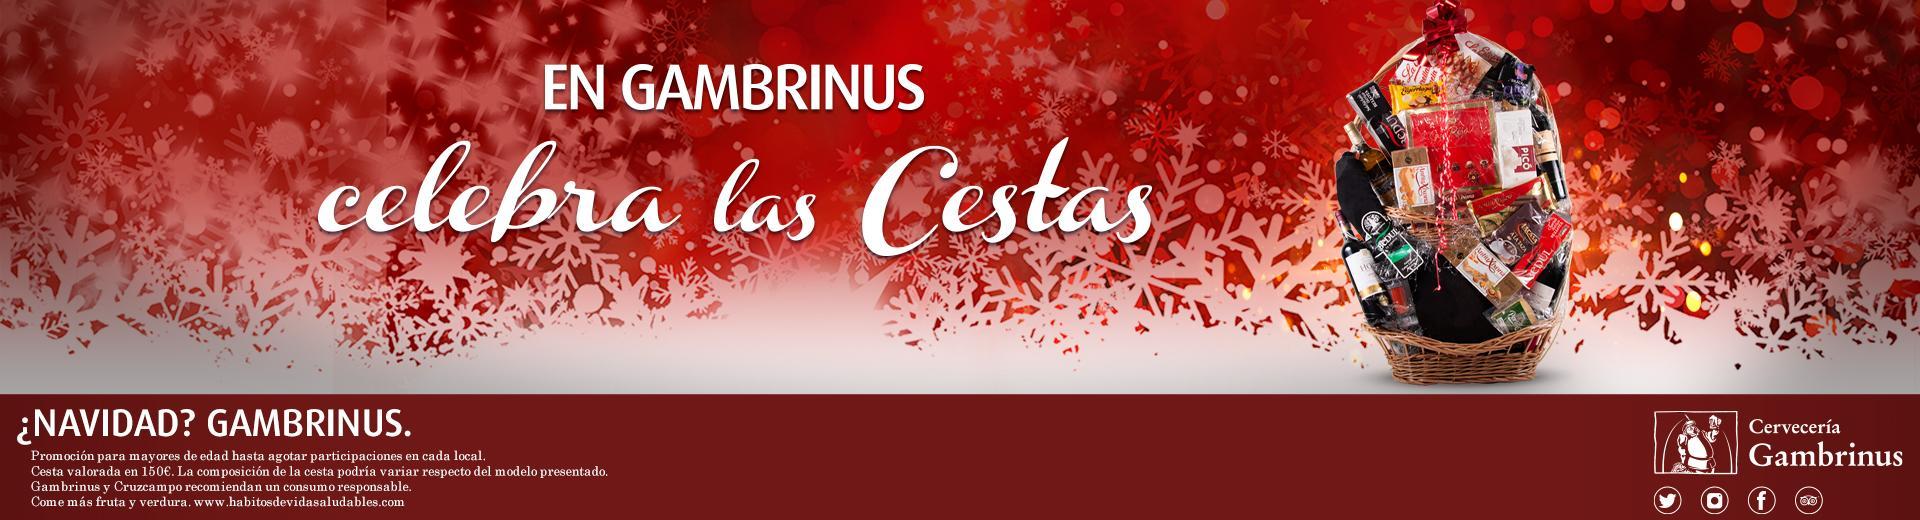 Navidad 2019 Gambrinus